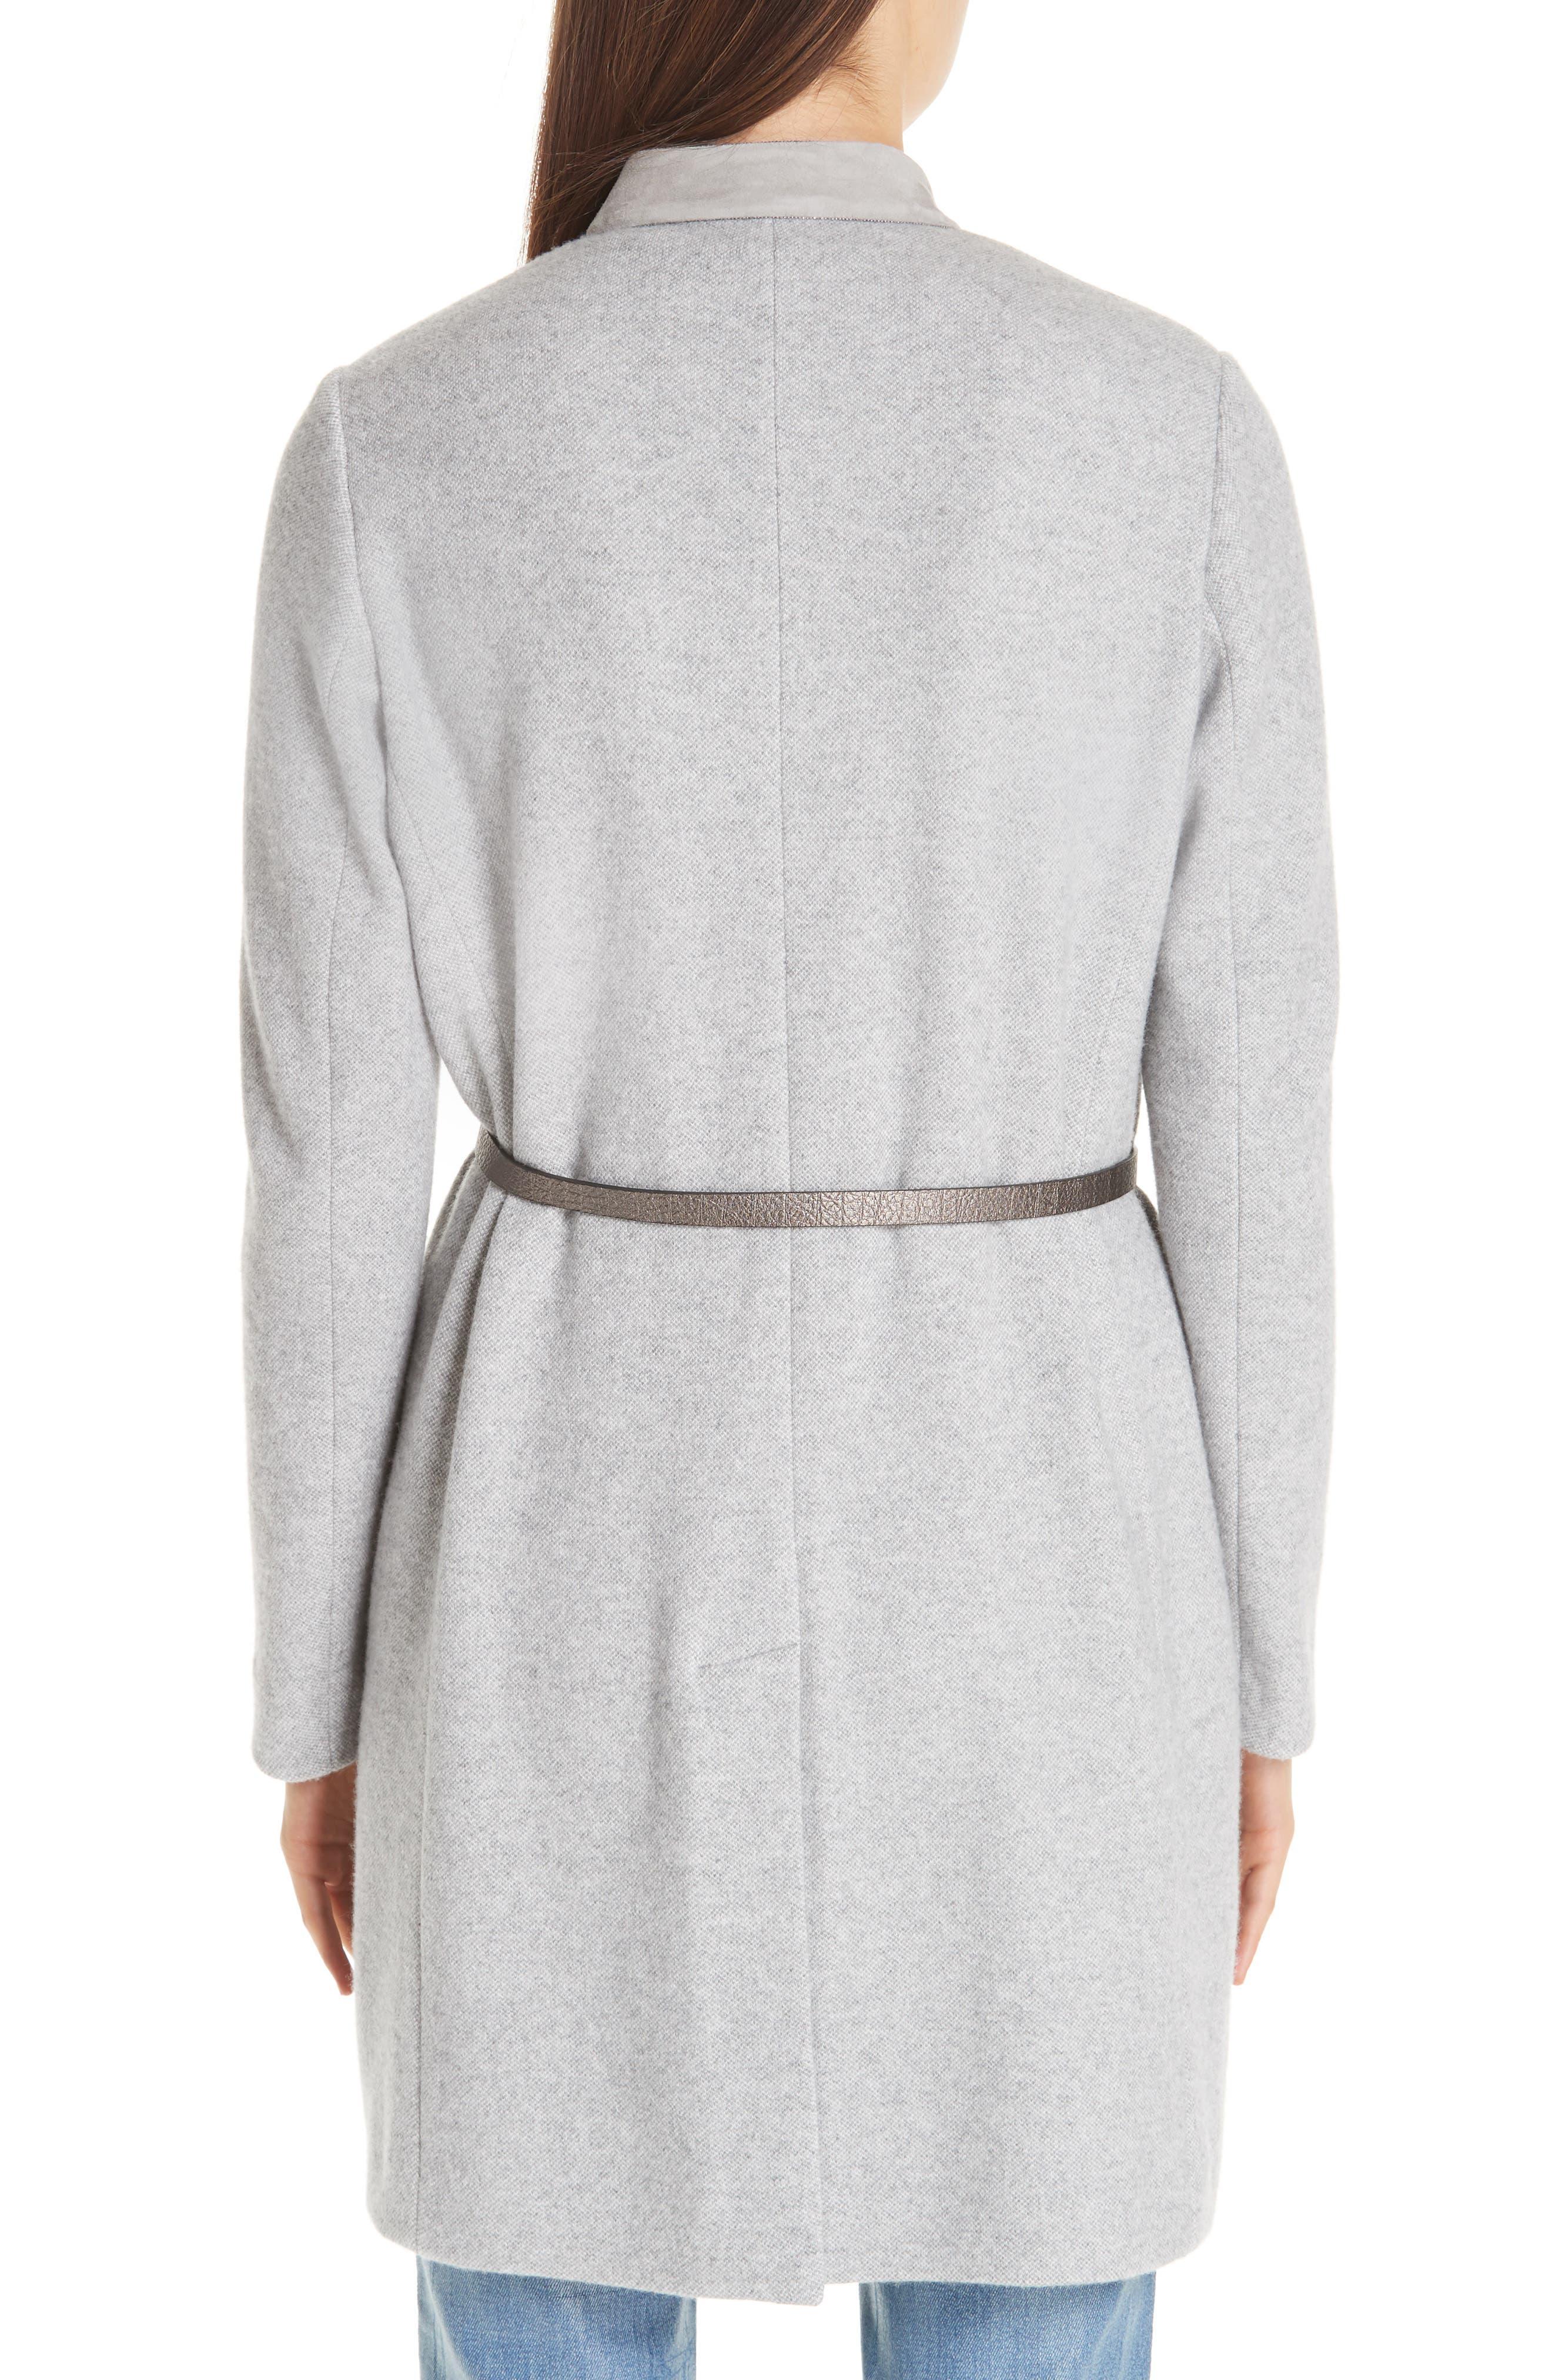 FABIANA FILIPPI,                             Suede Trim Tweed Jacket,                             Alternate thumbnail 2, color,                             GREY